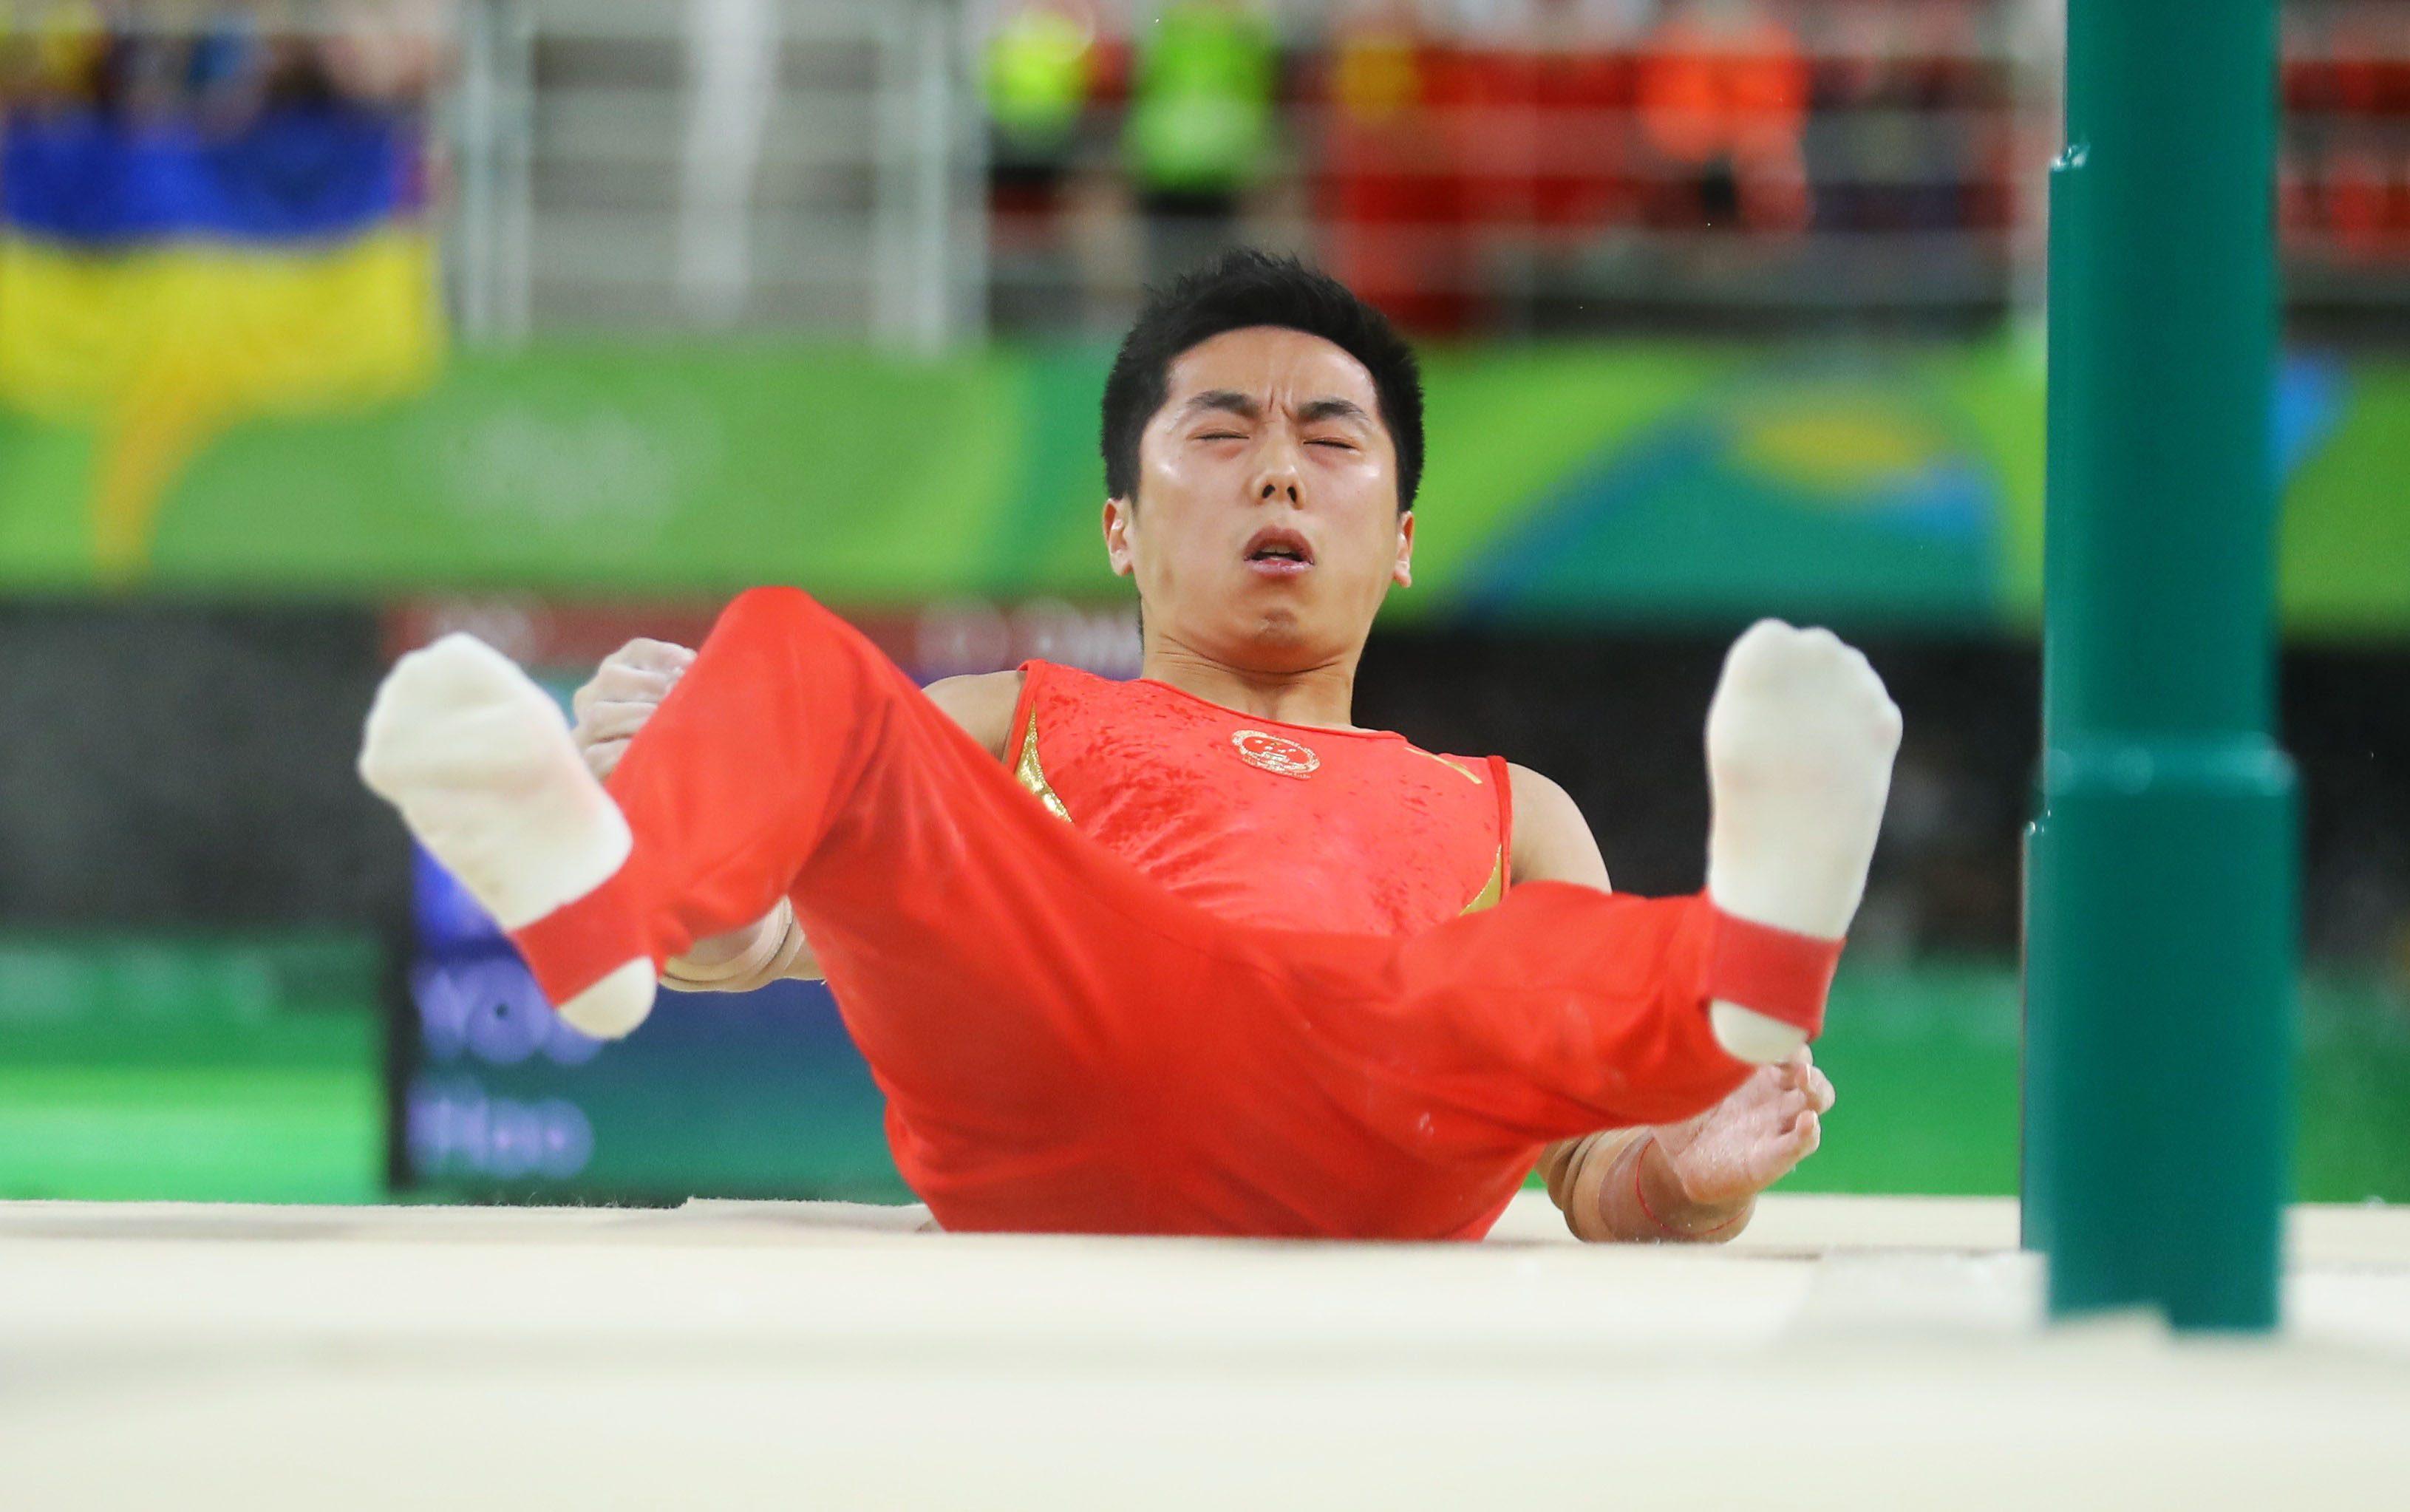 2016 Rio Olympics in Artistic Gymnastics on Men's Parallel Bars Final